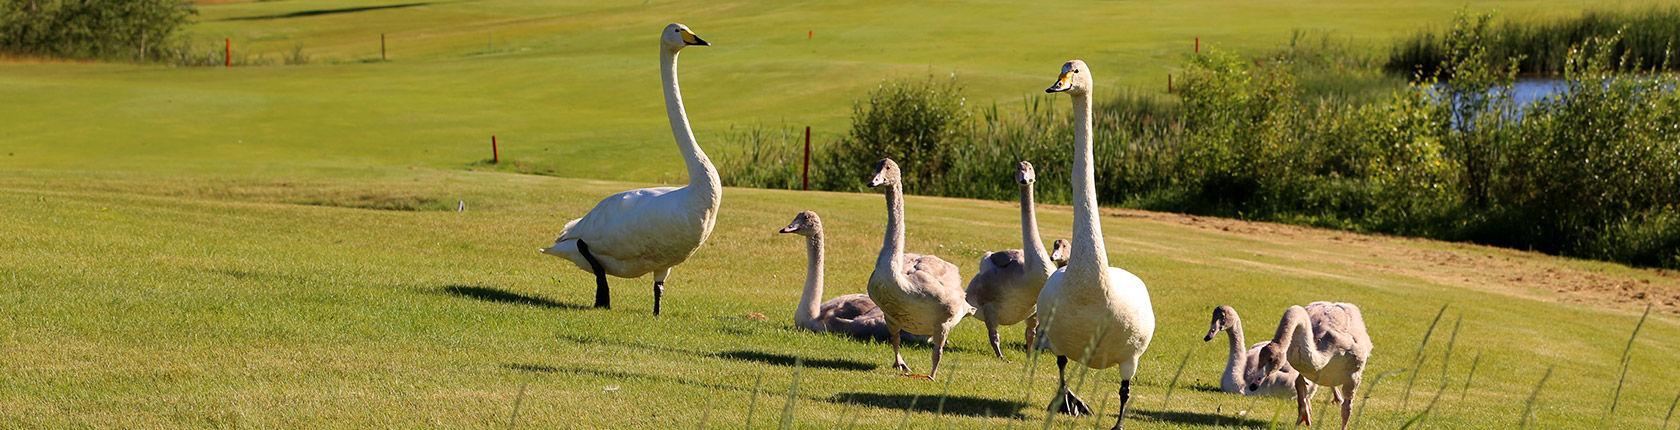 Aulanko Golf GEO environmental certification